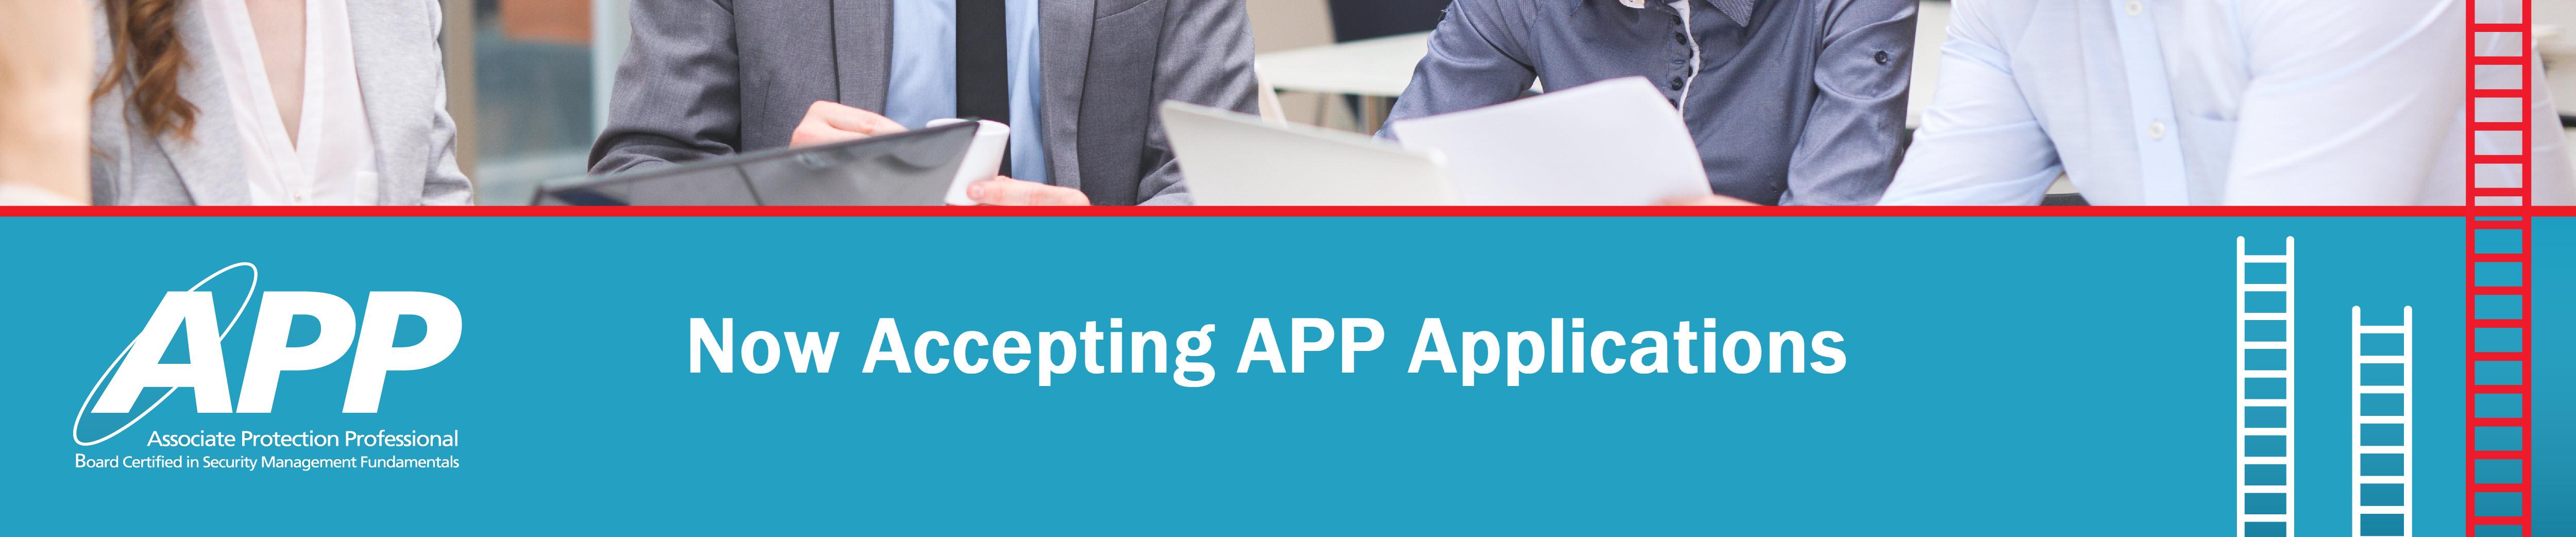 APP Certification